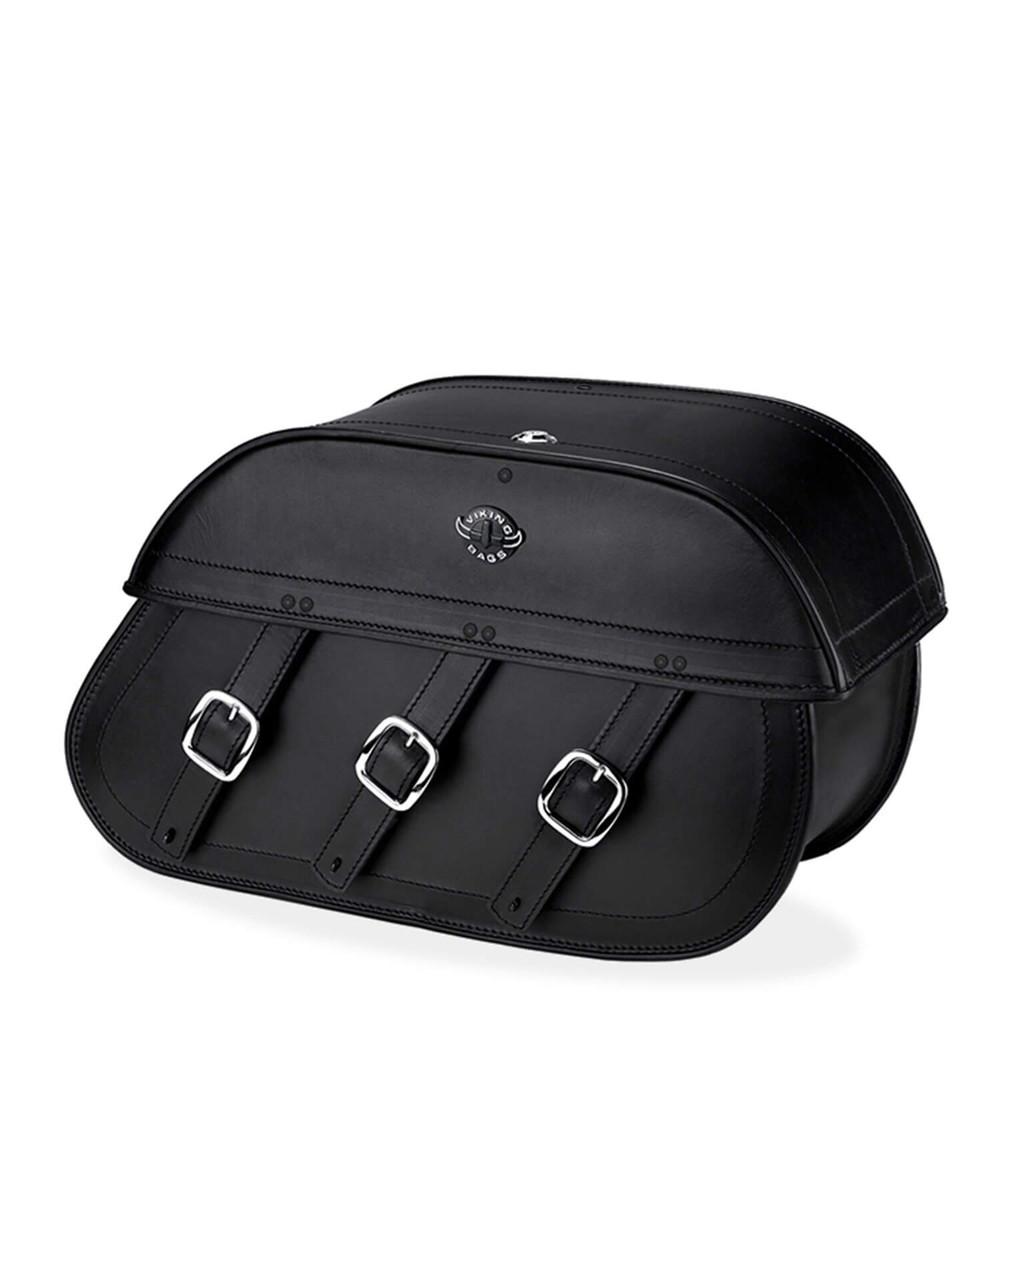 Suzuki Boulevard C90,VL1500, Intruder Trianon Saddle Bag